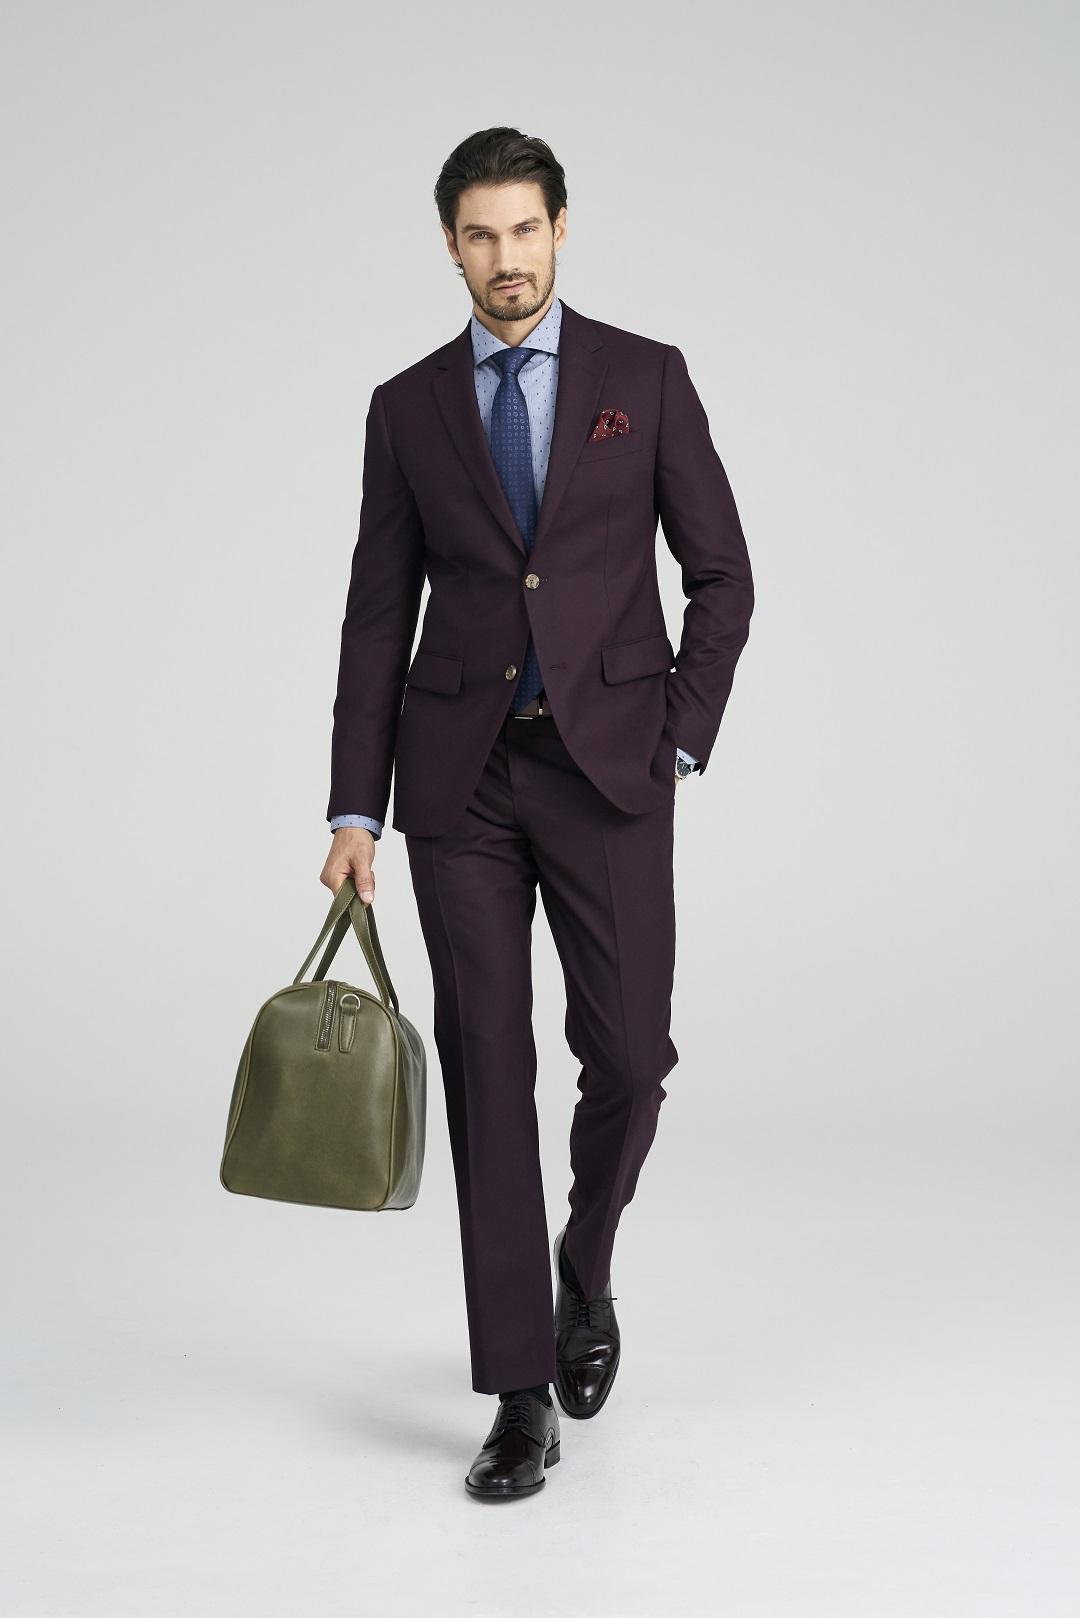 Hayward Flannel Burgundy Suit